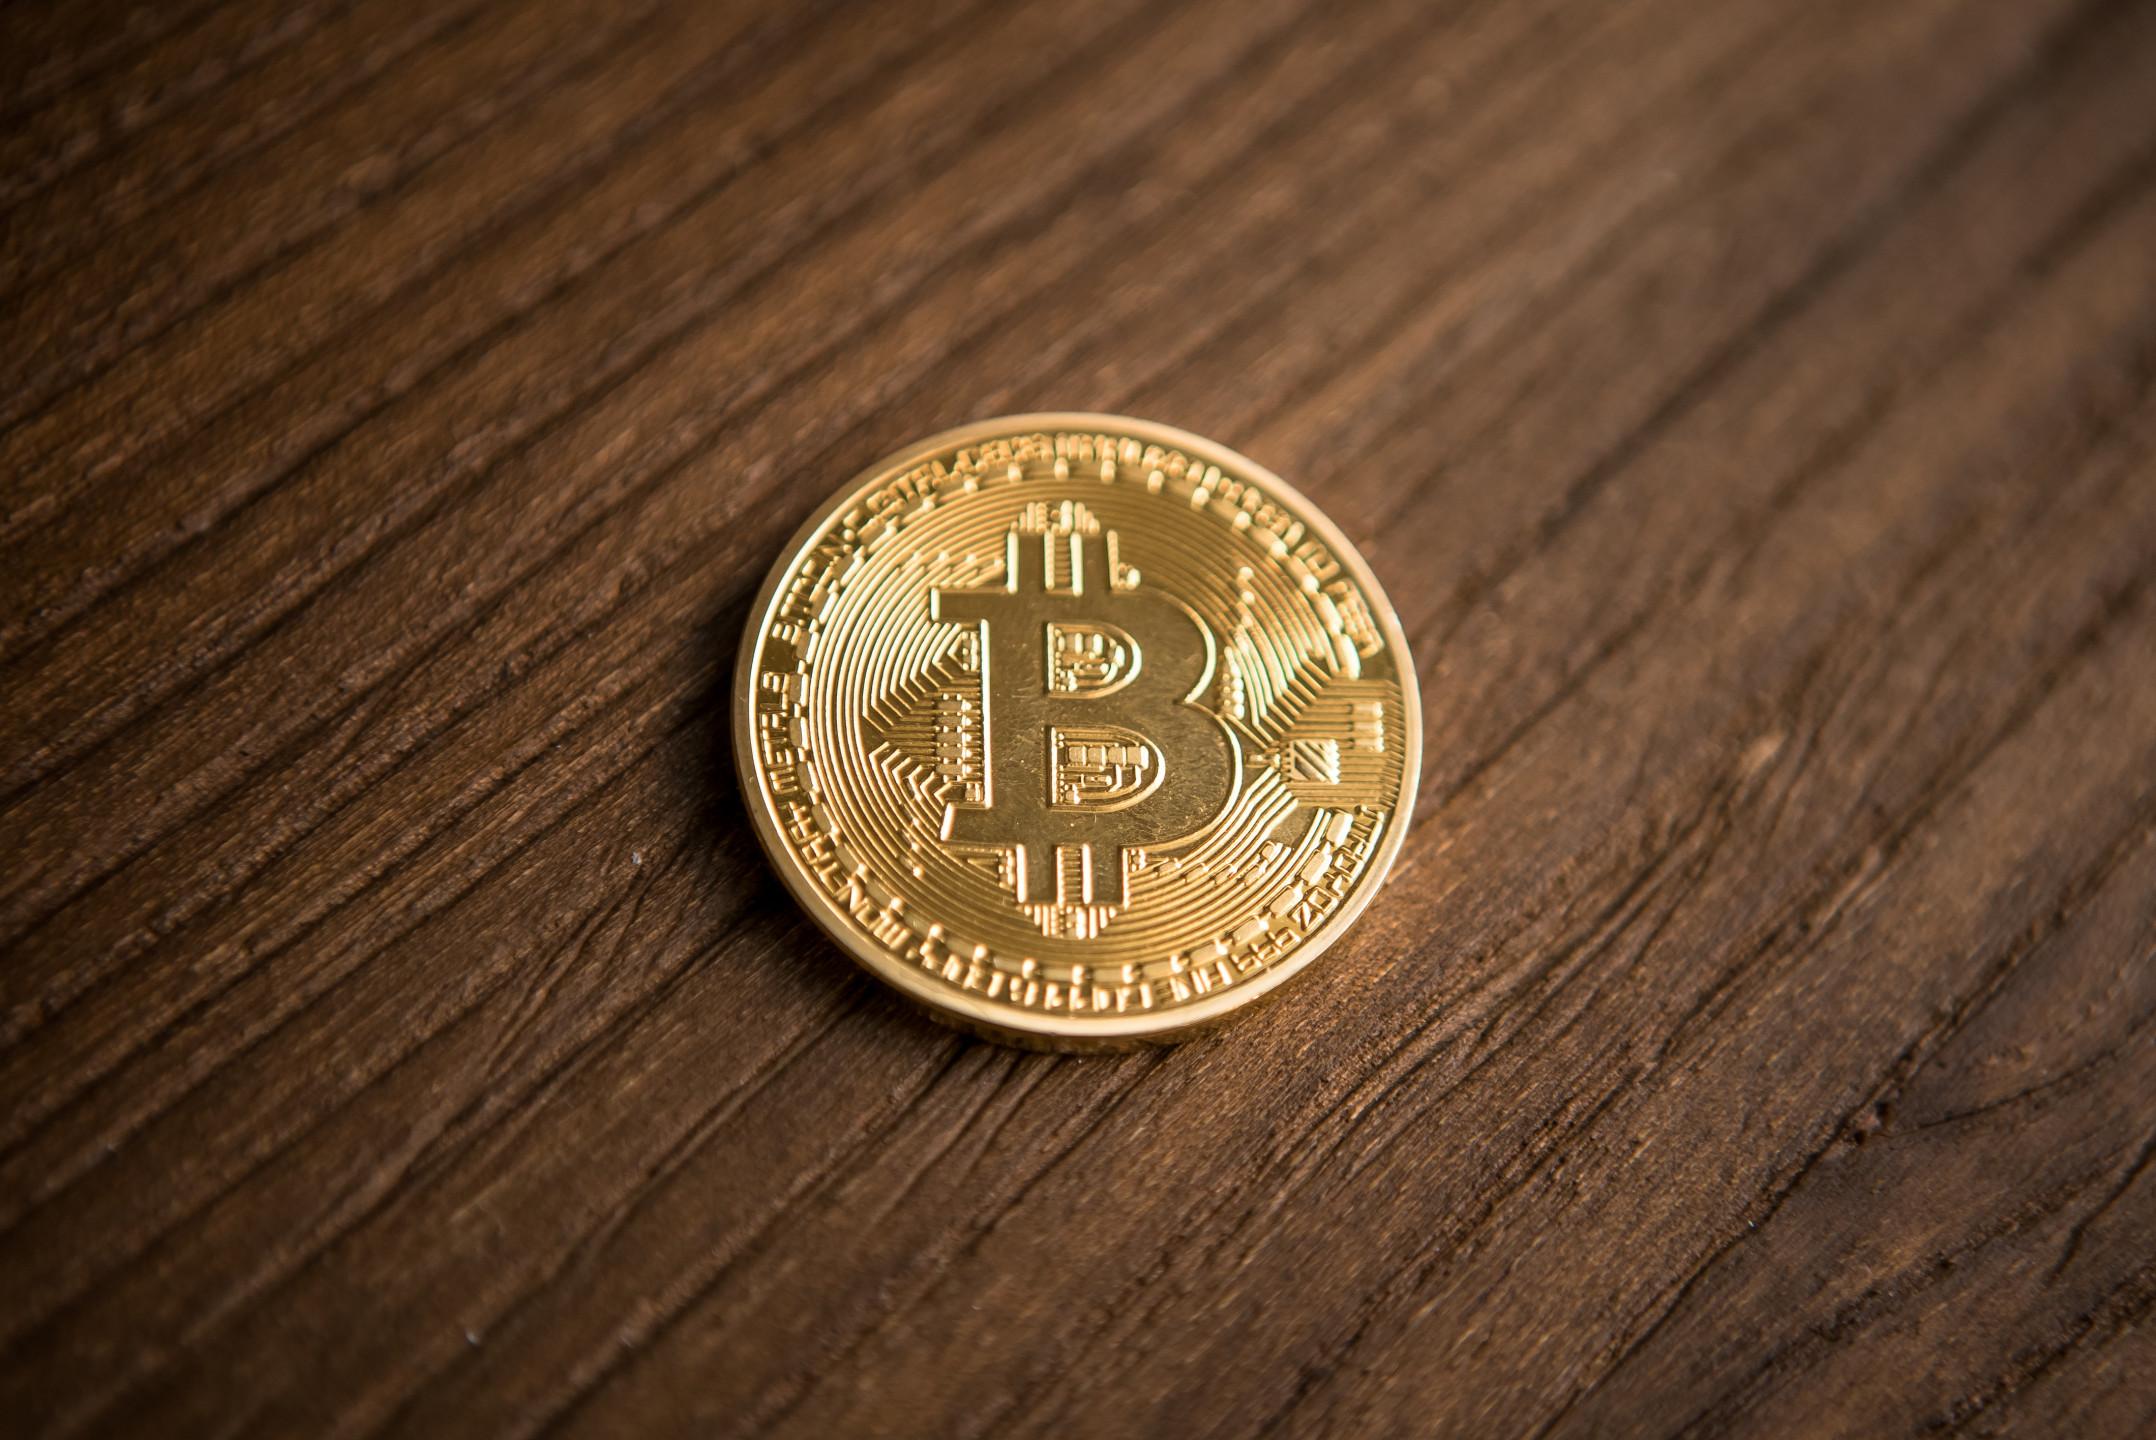 Bitcoin price analysis - BTCUSD attempting to regain upside momentum